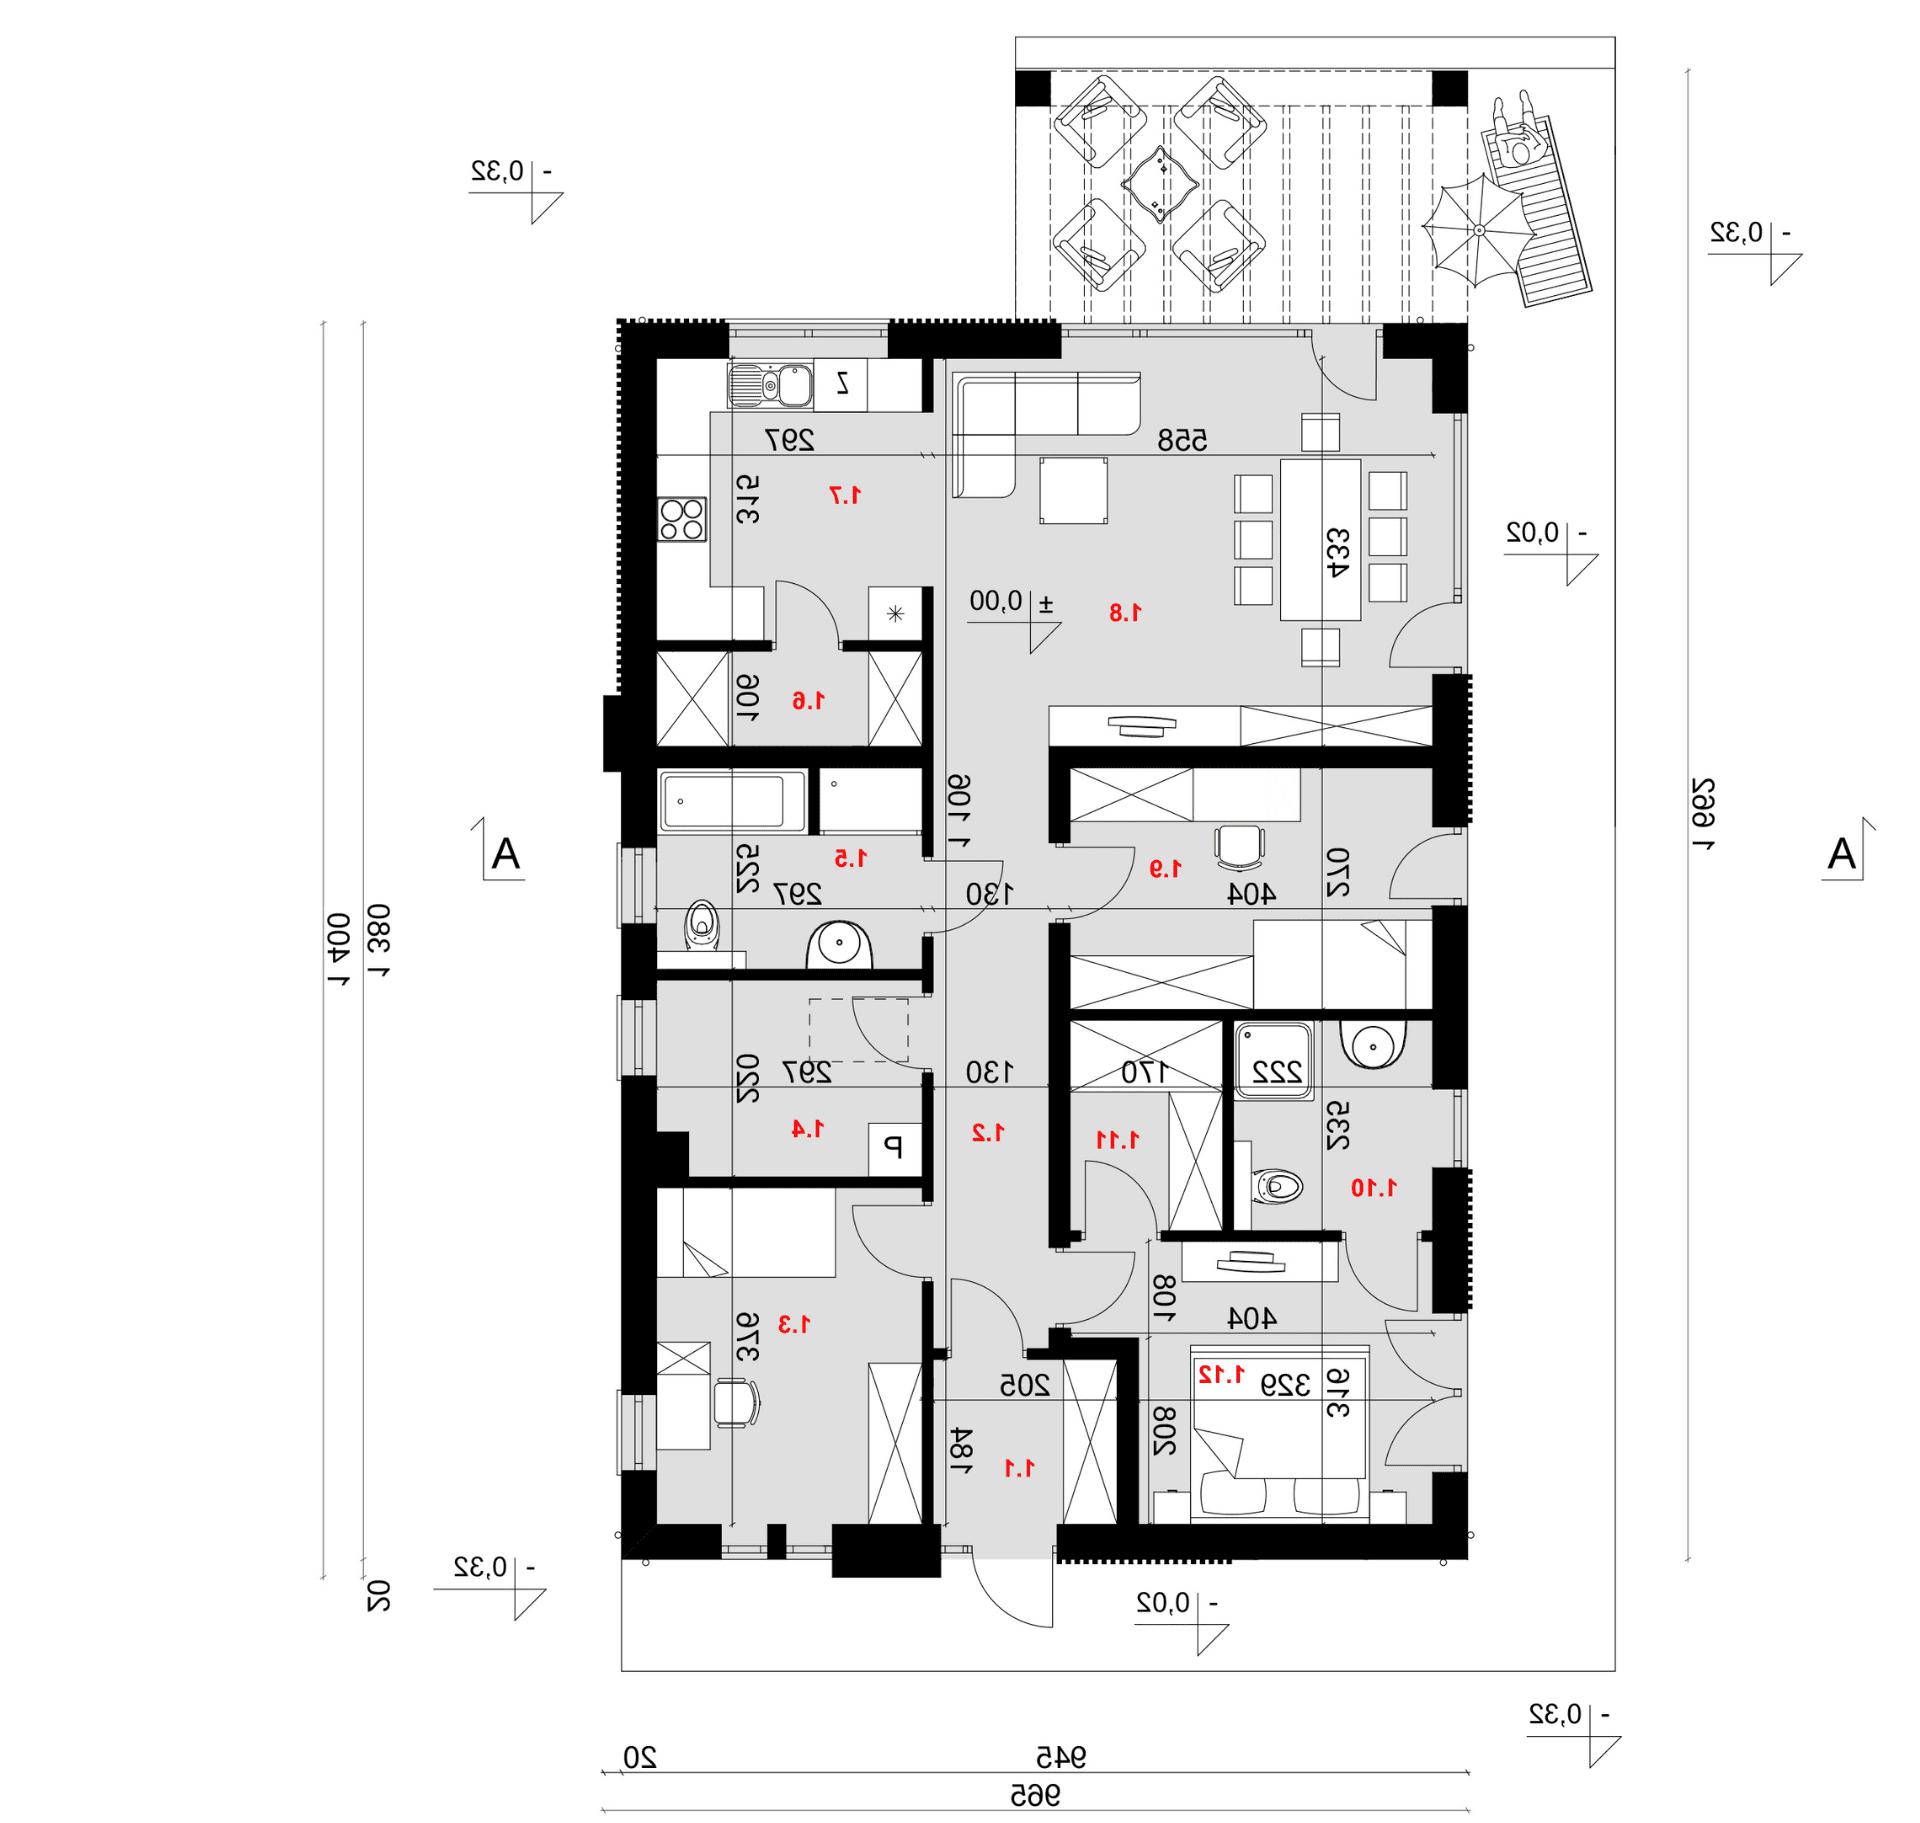 Rzut parteru - projekt domu SEJ-PRO 051 ENERGO - odbicie lustrzane